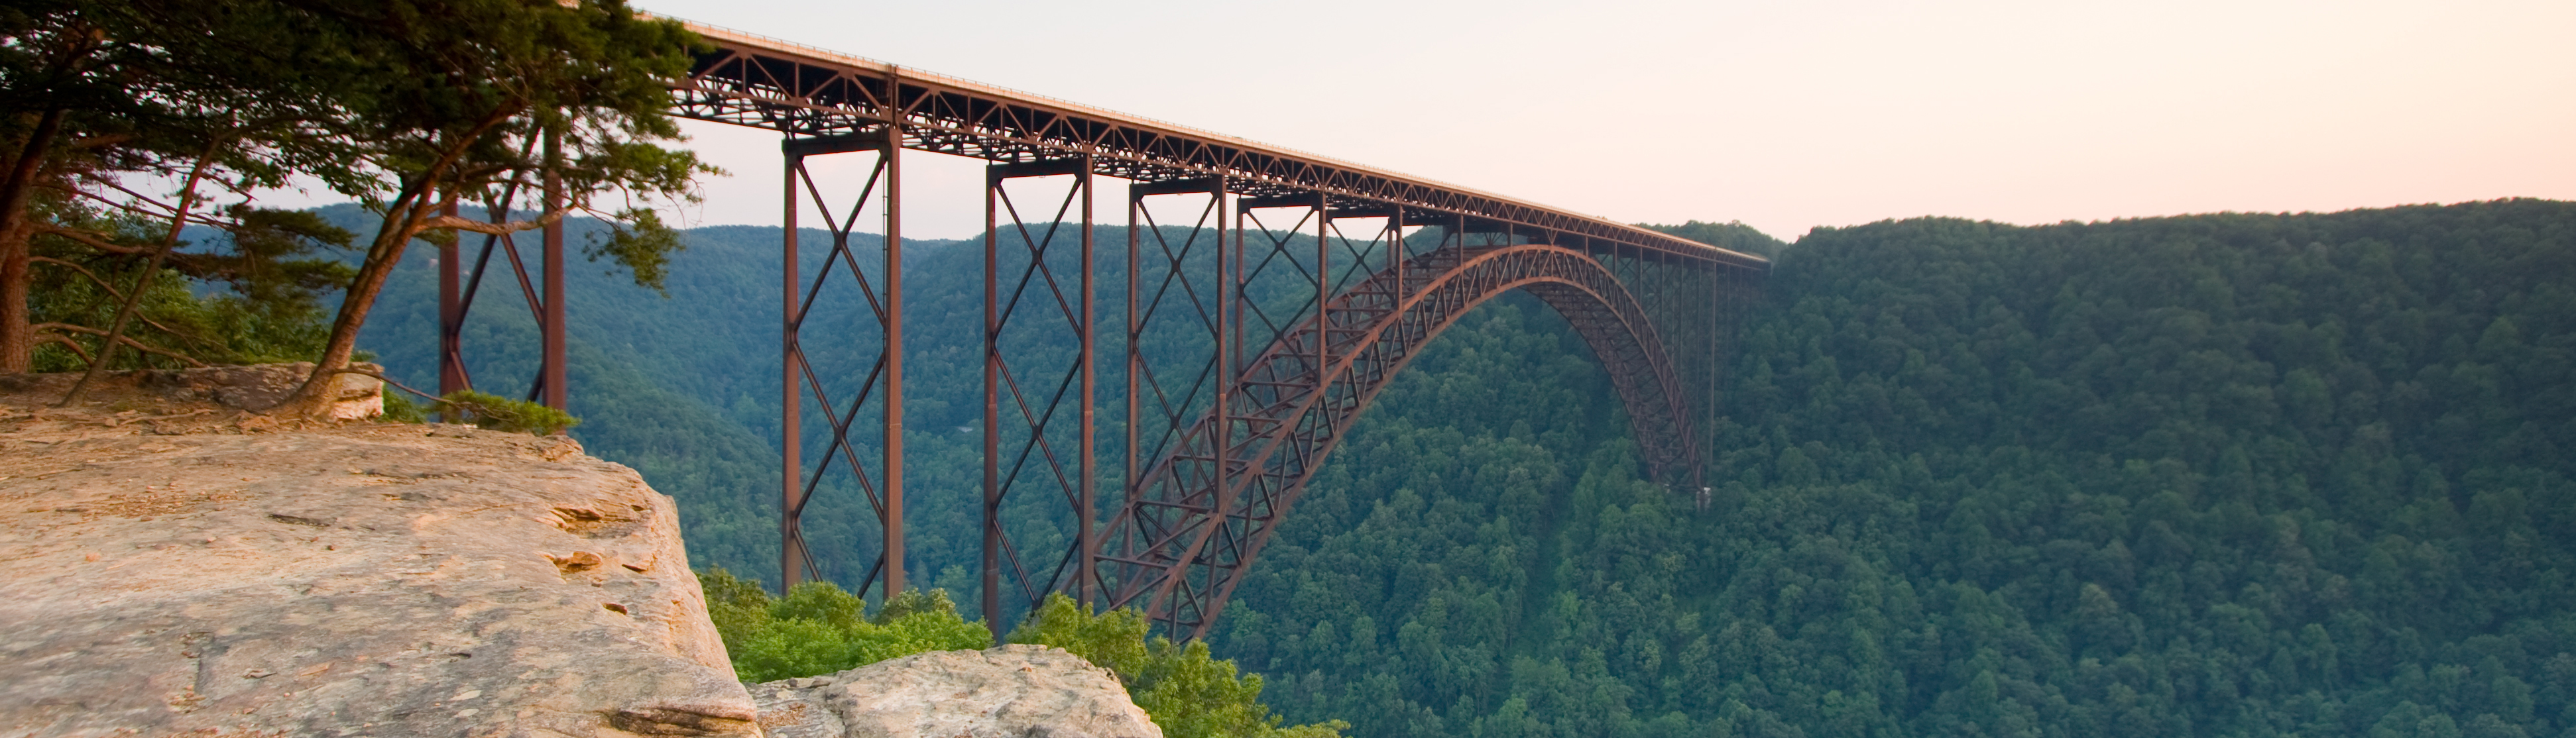 New River Gorge Cabins Bridge